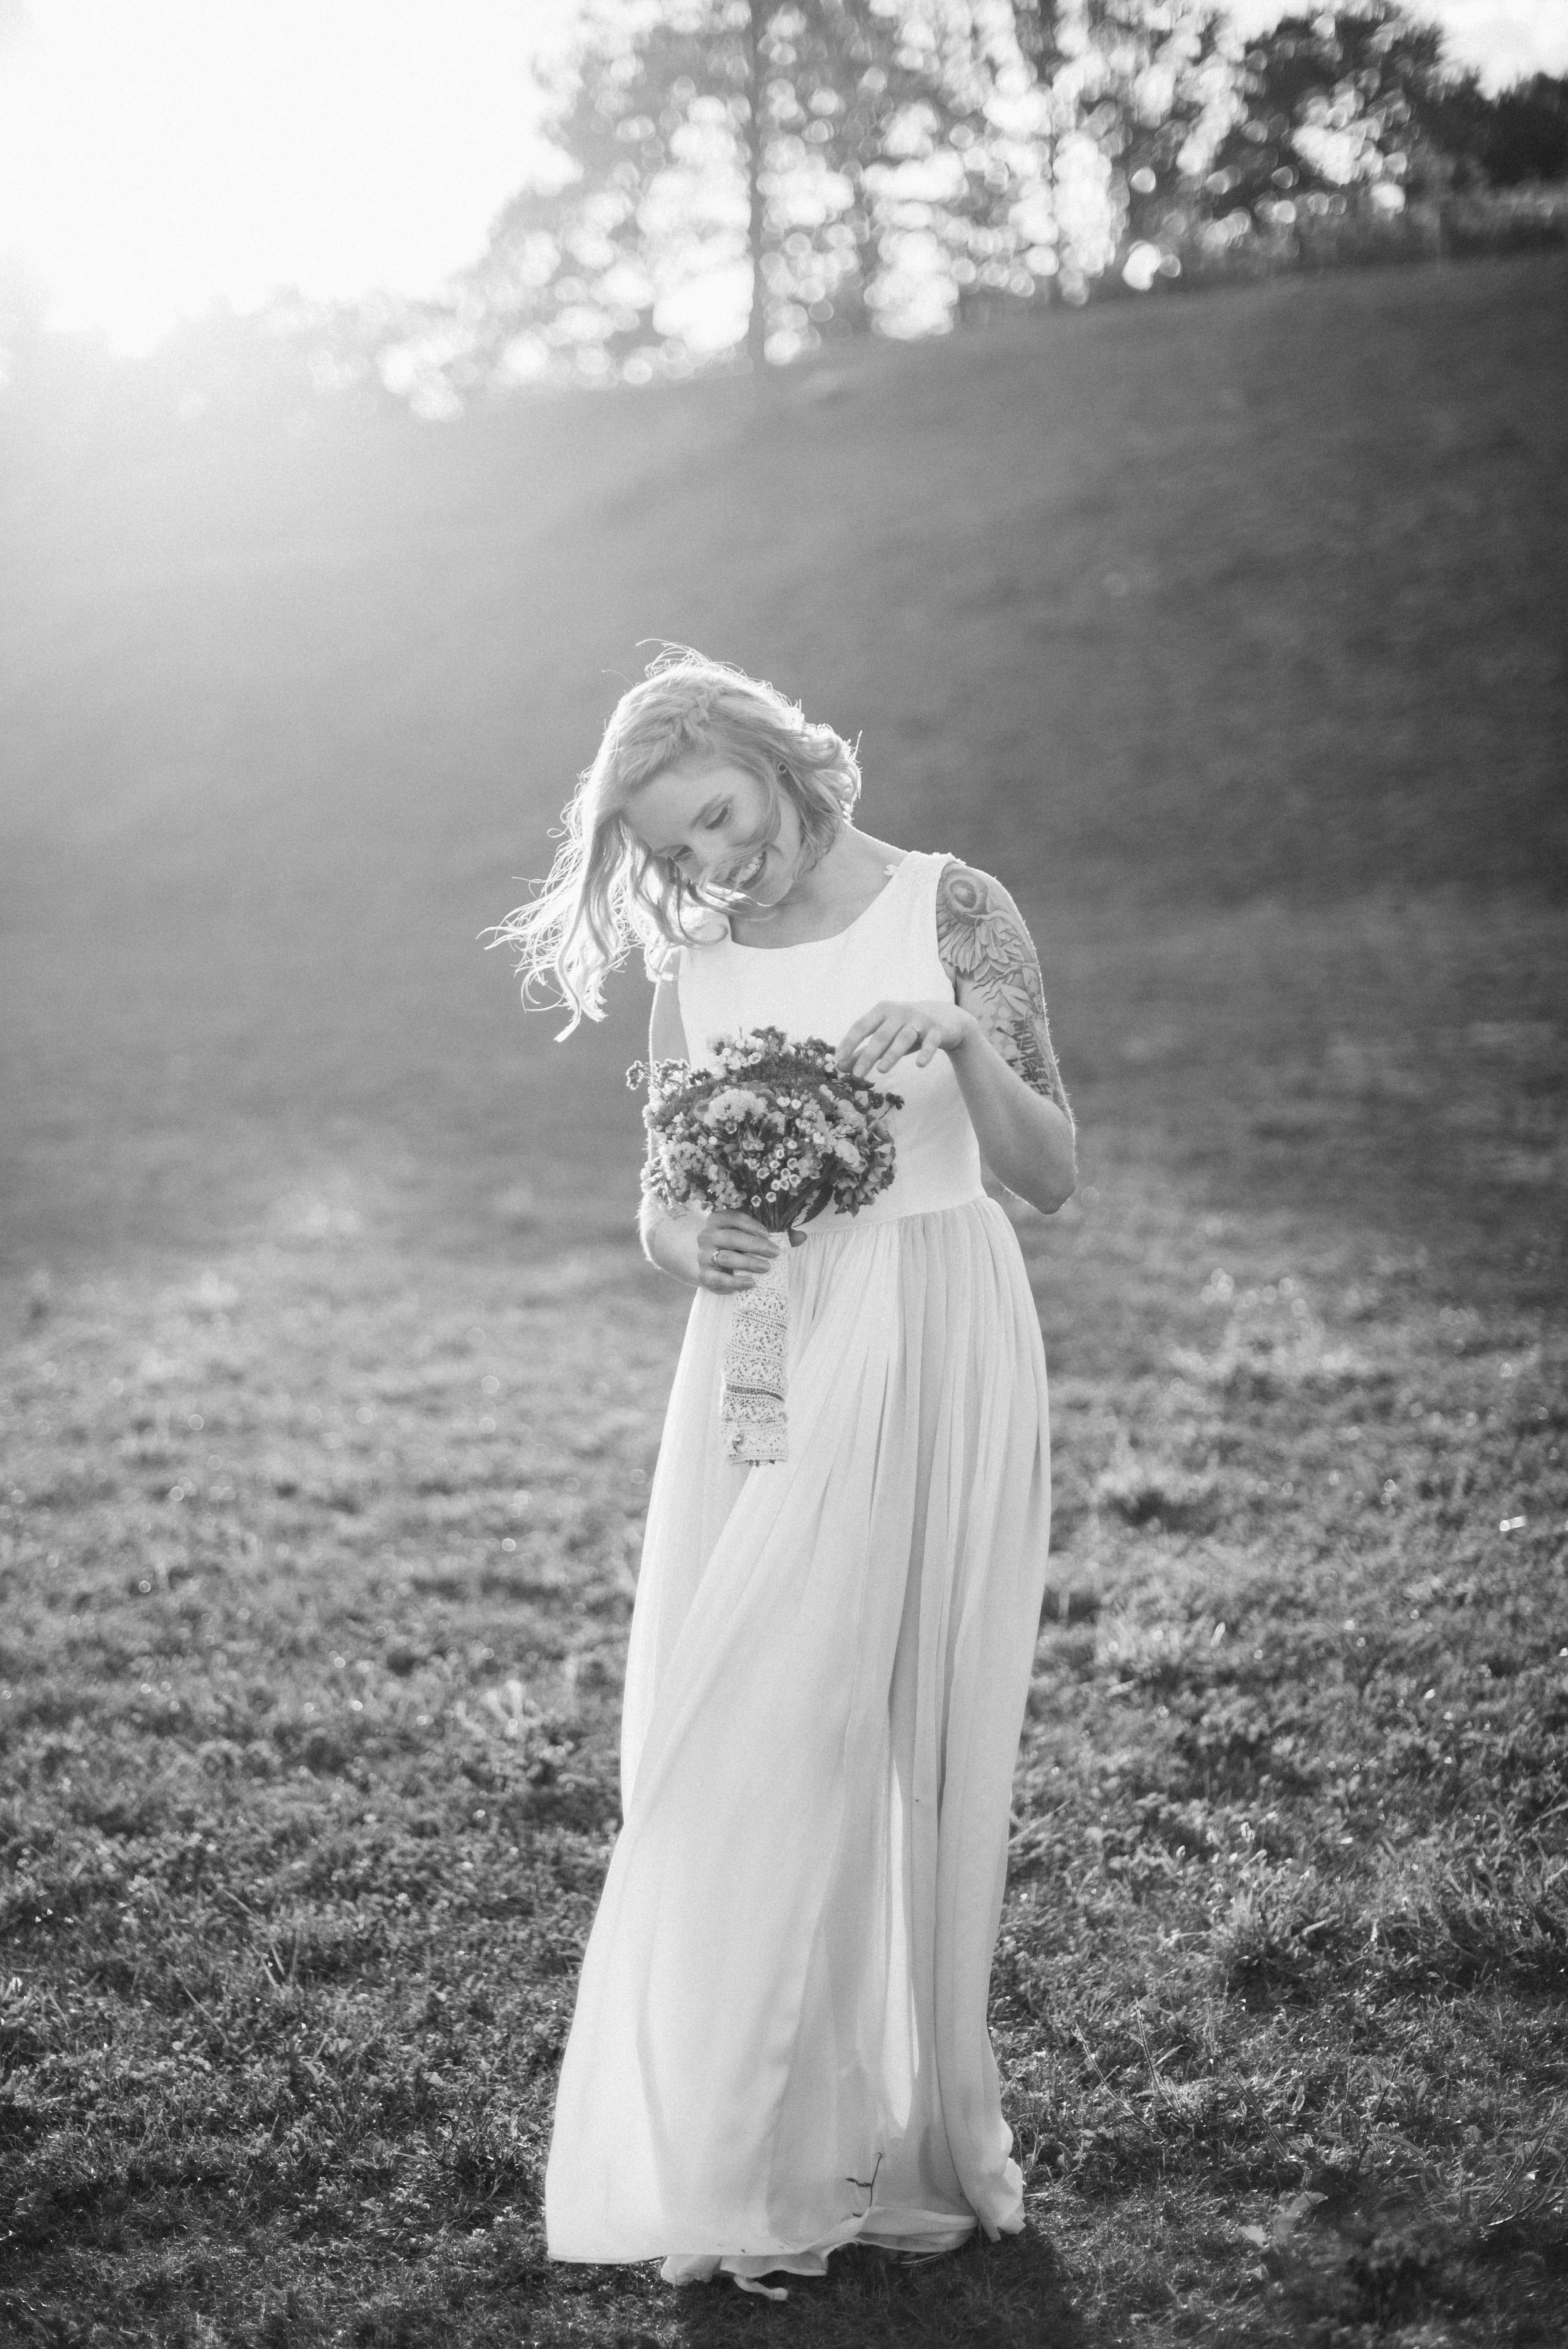 Yosemite Park Wedding | Neža Reisner - Wedding Photographer